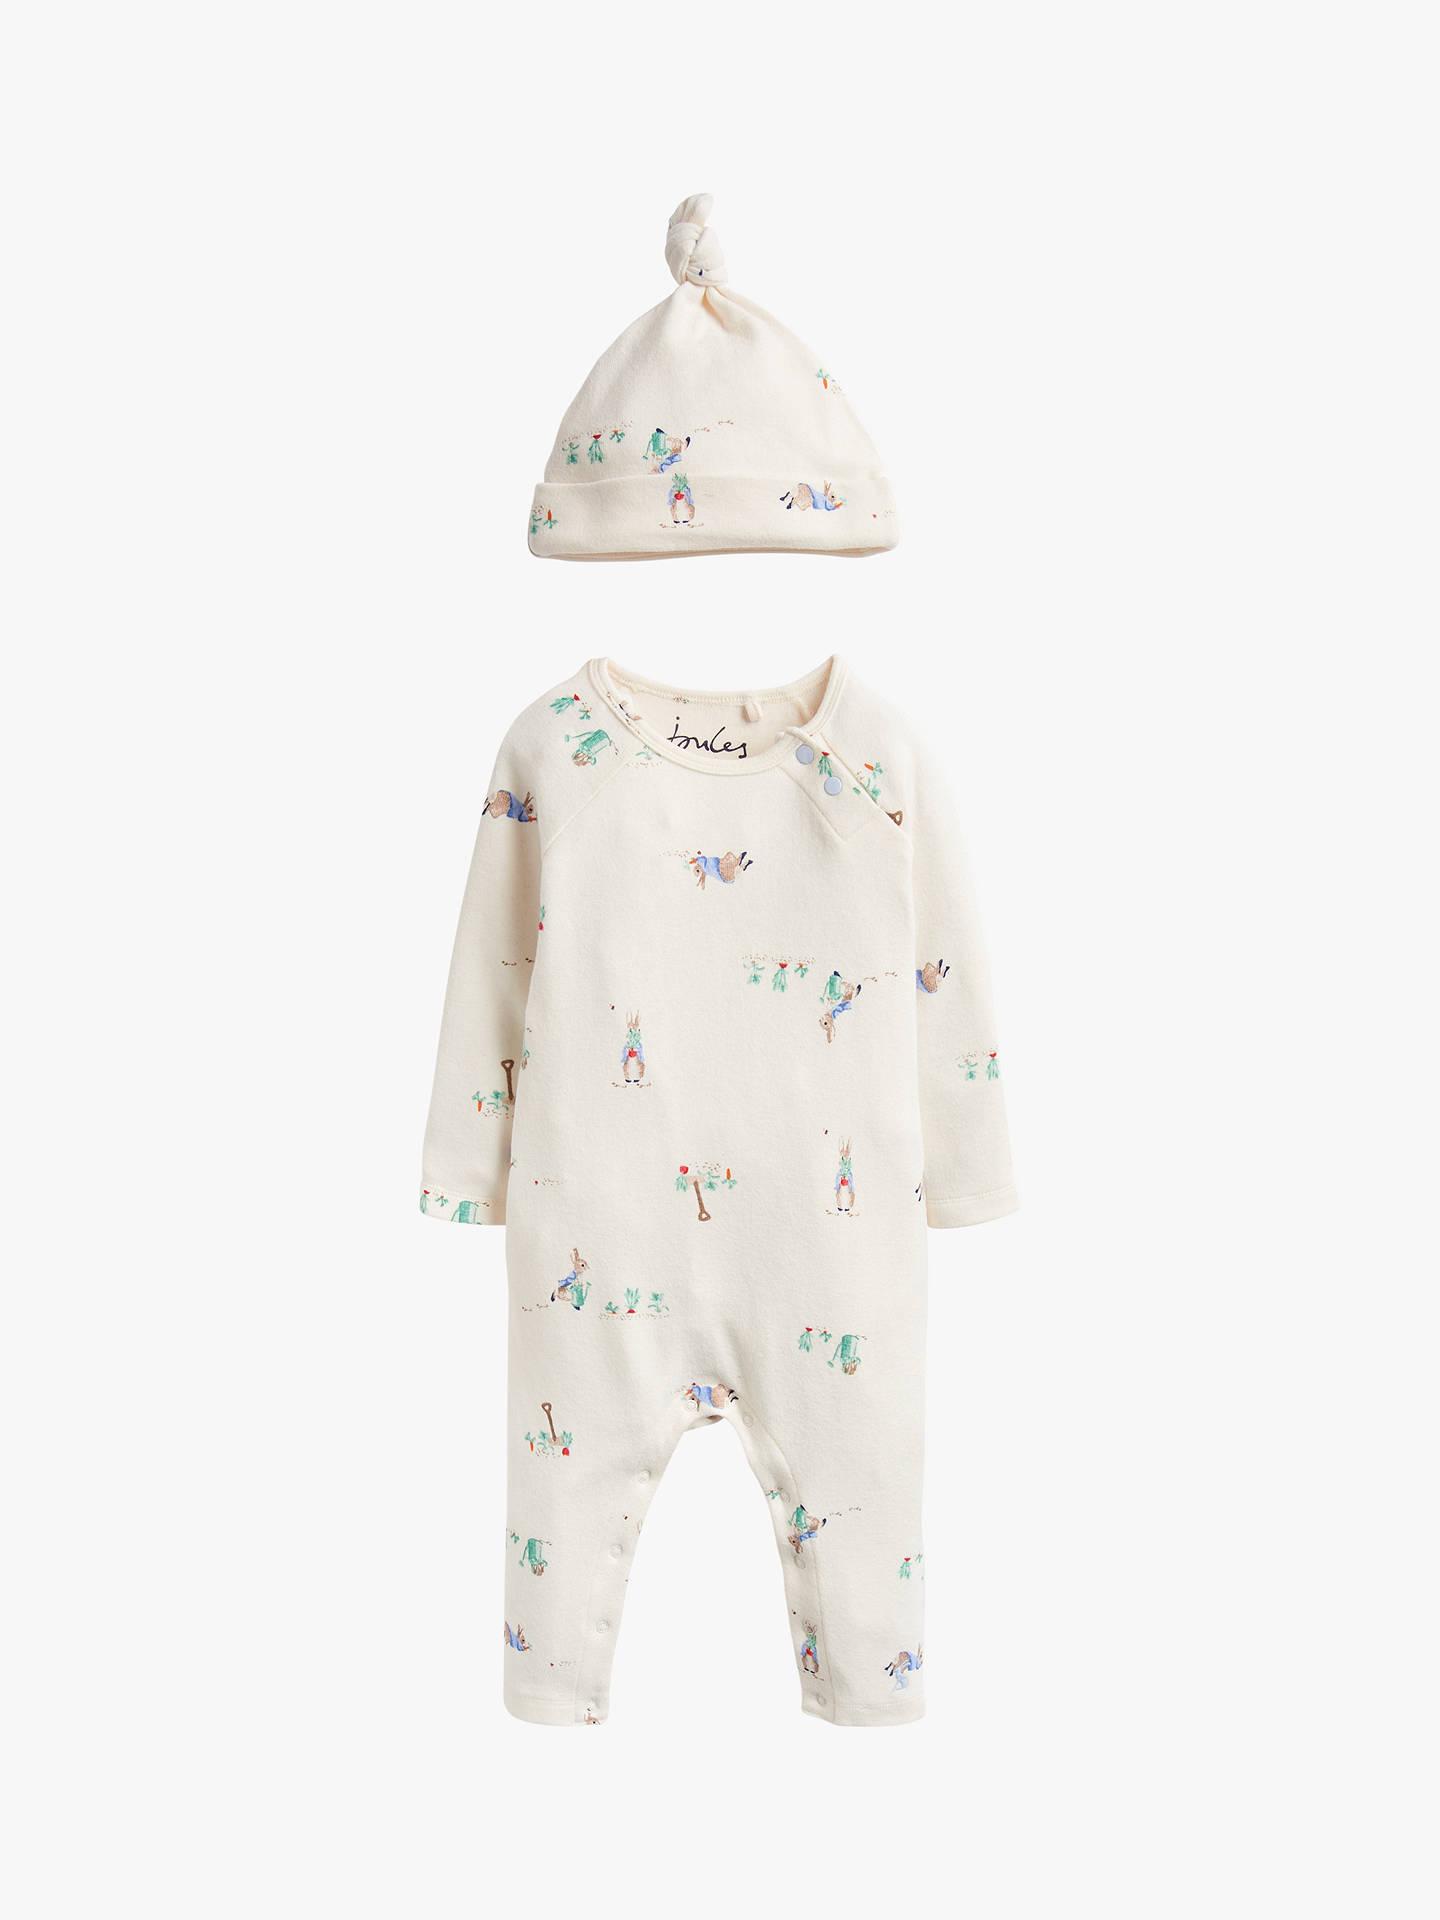 dbd69d307b7c5 Baby Joule Giggle Peter Rabbit Babygrow, Cream